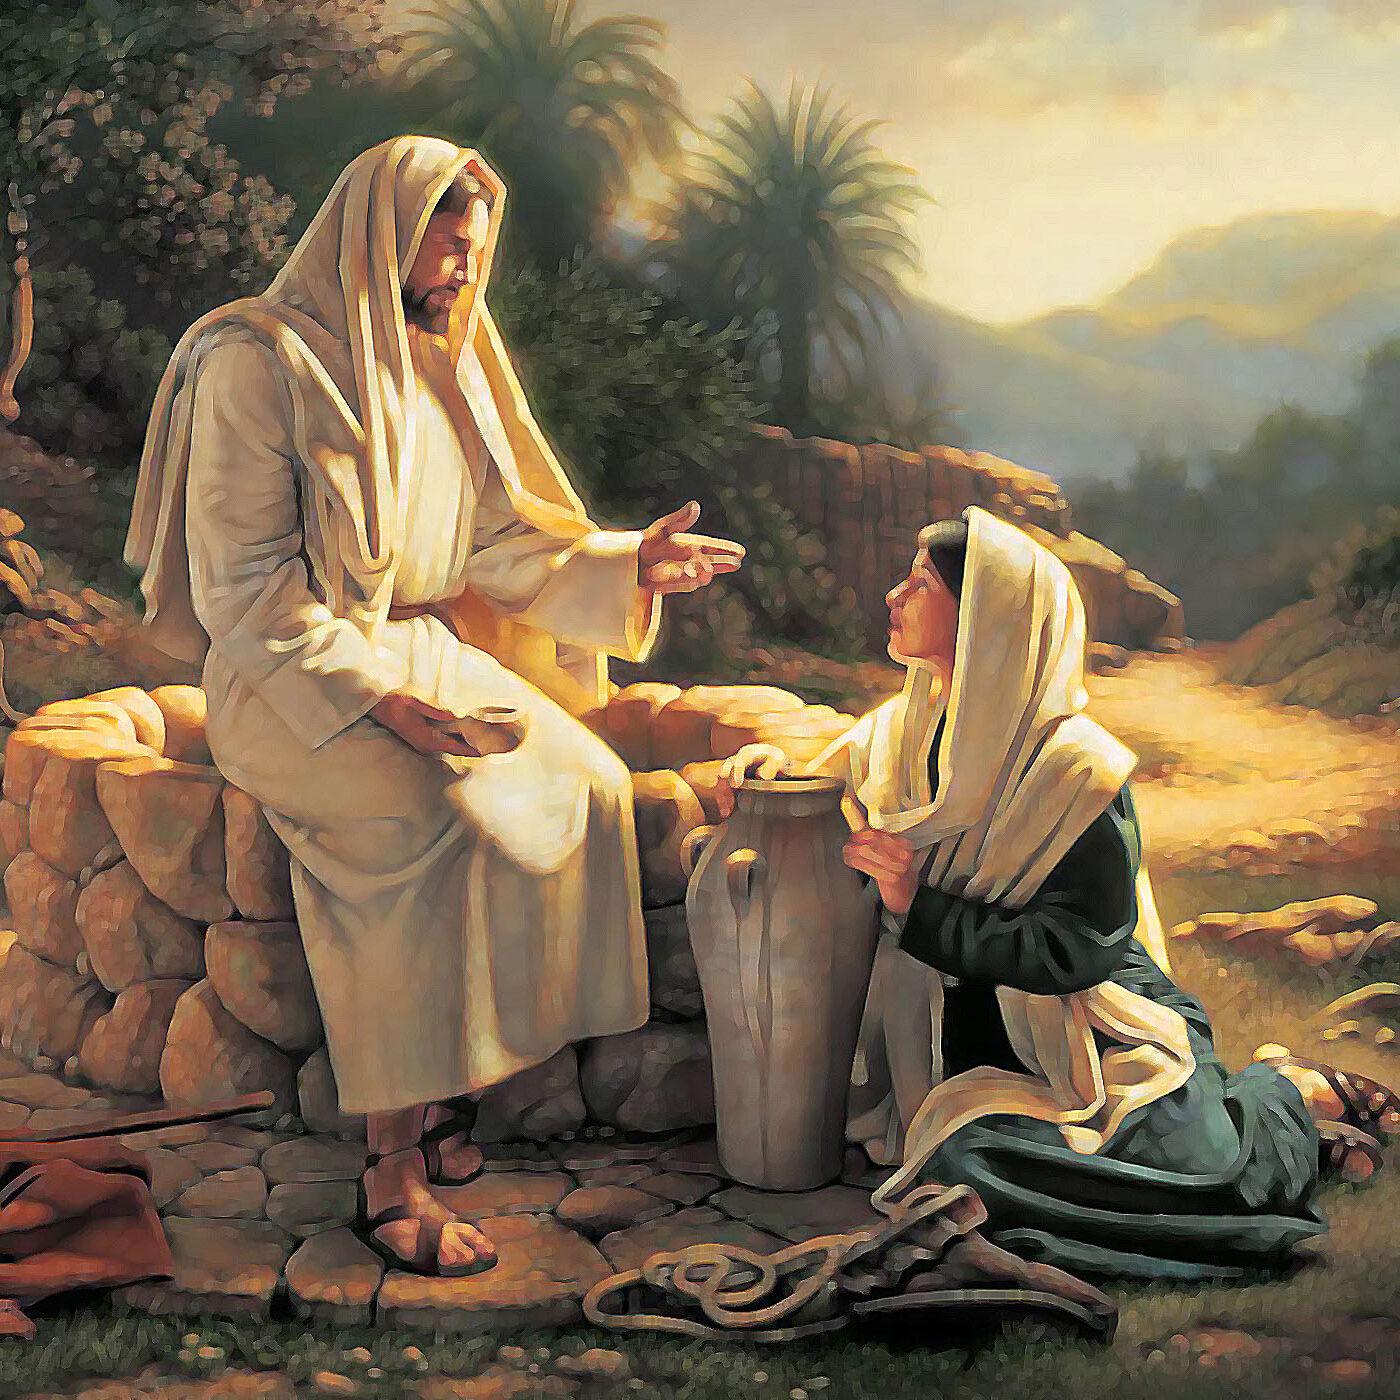 riflessioni sul Vangelo di Mercoledì 6 Ottobre 2021 (Lc 11, 1-4)